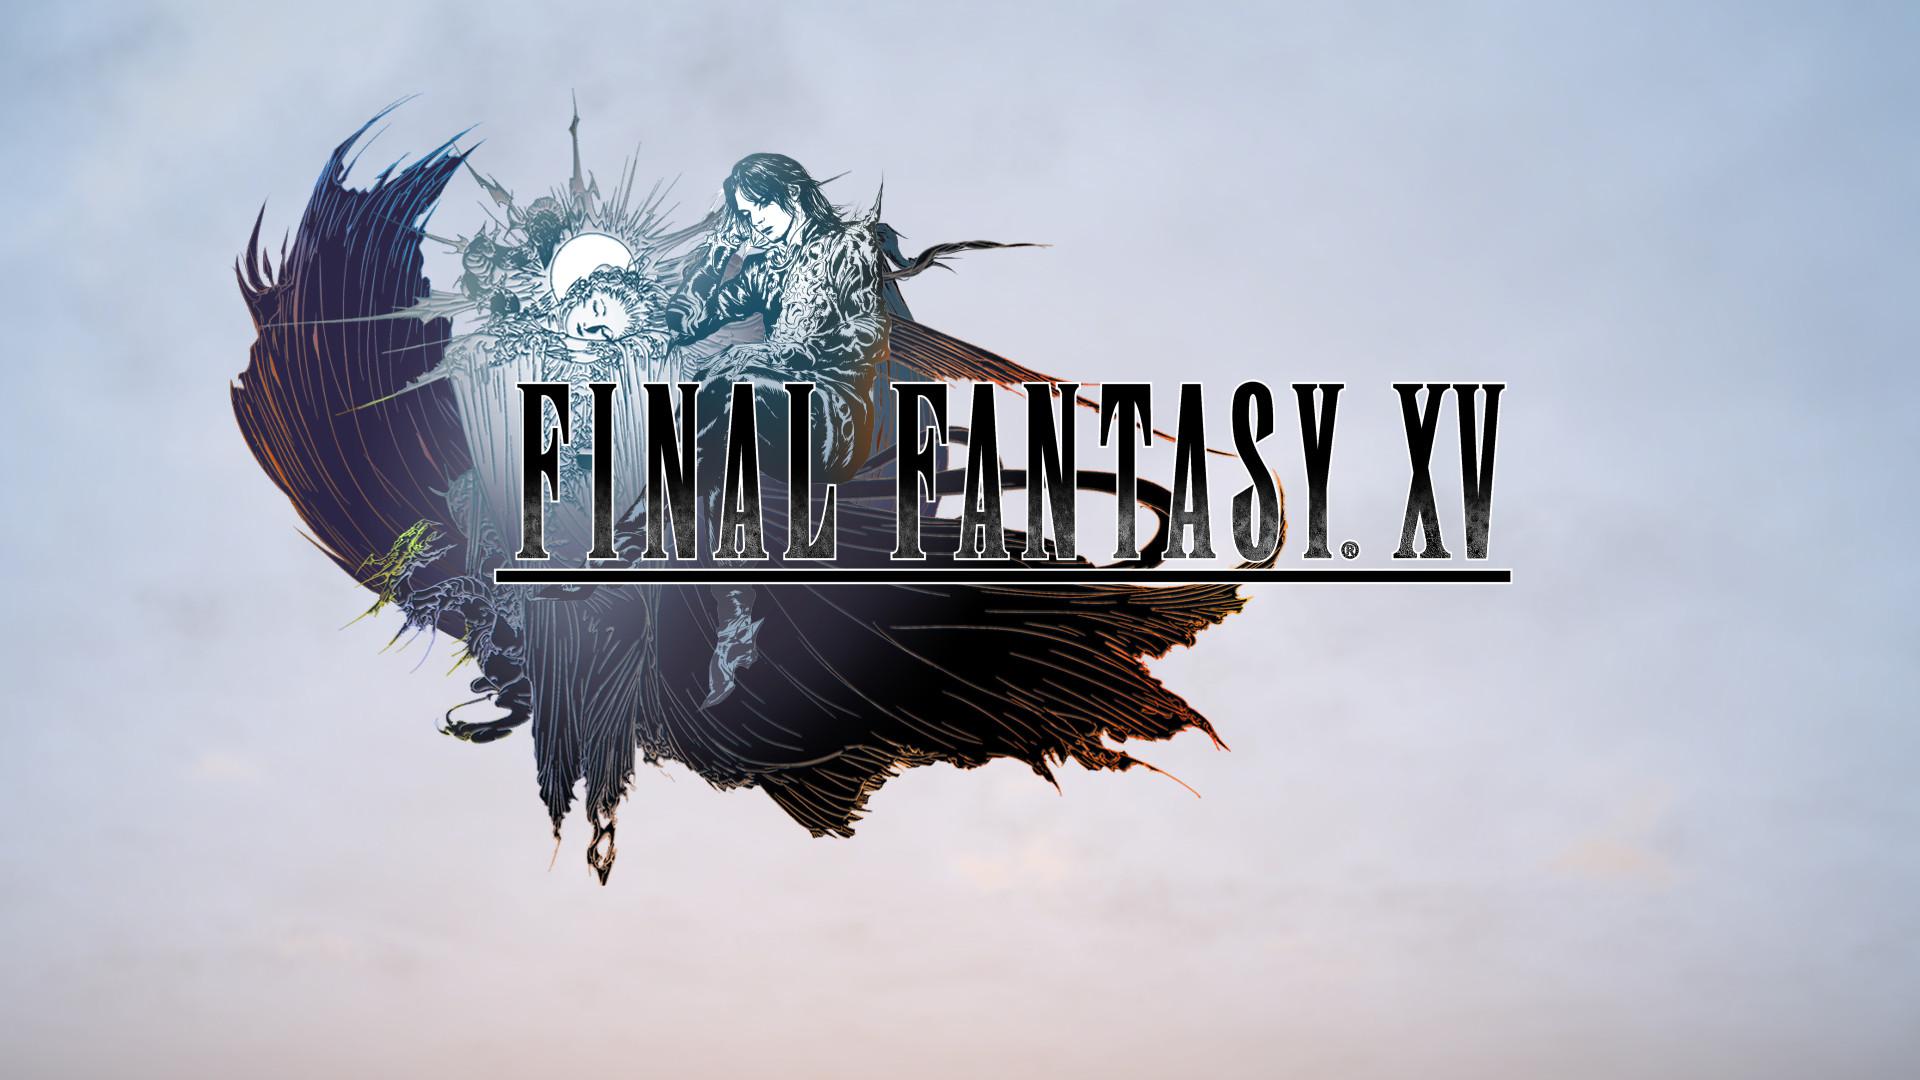 Aranea Highwind Final Fantasy Xv 5k Hd Games 4k: Final Fantasy XV Wallpaper (78+ Images